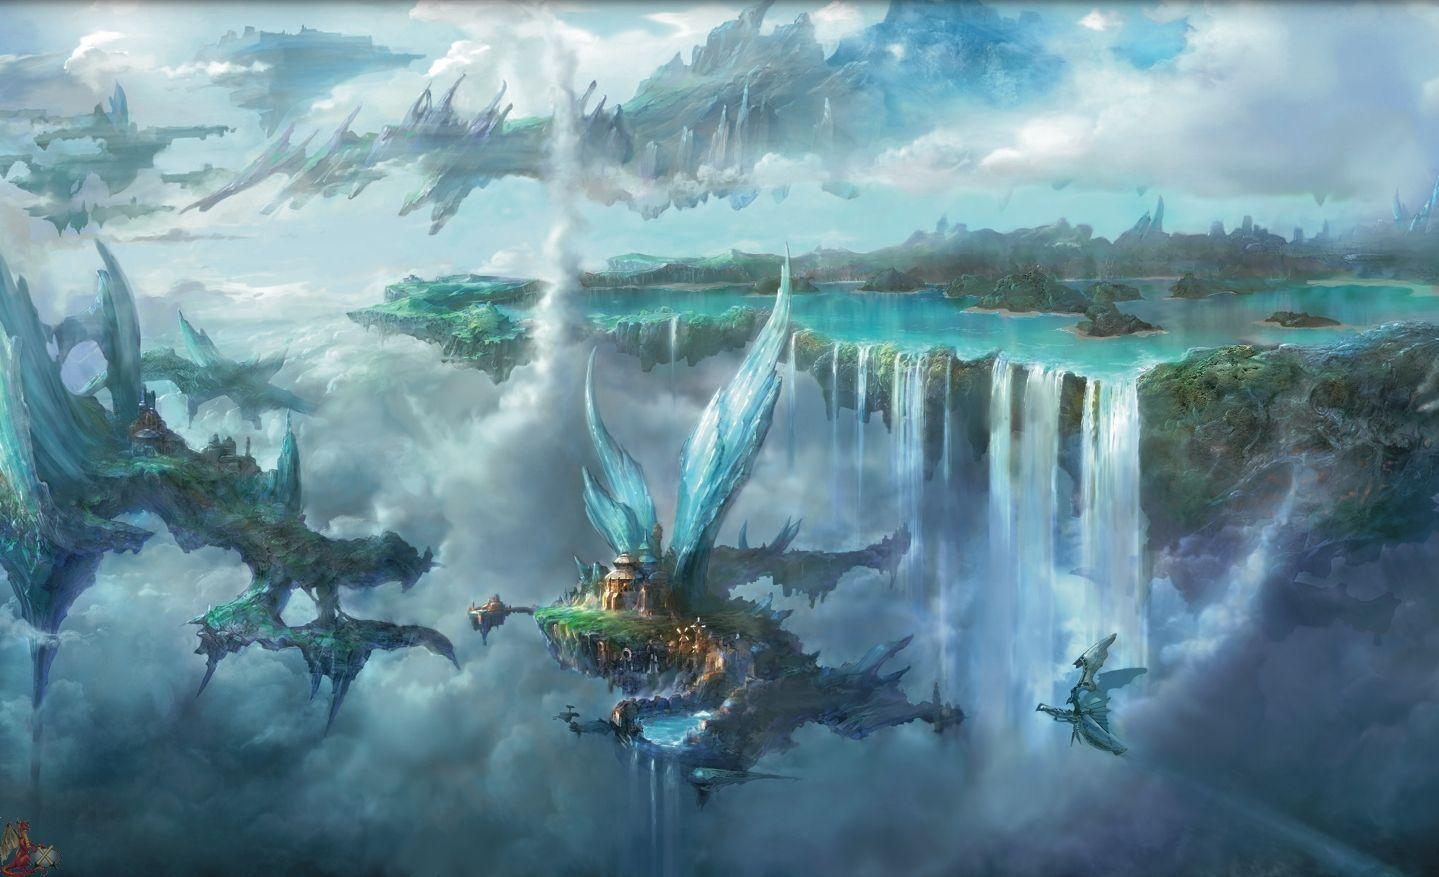 HD Final Fantasy Wallpapers 1439x877